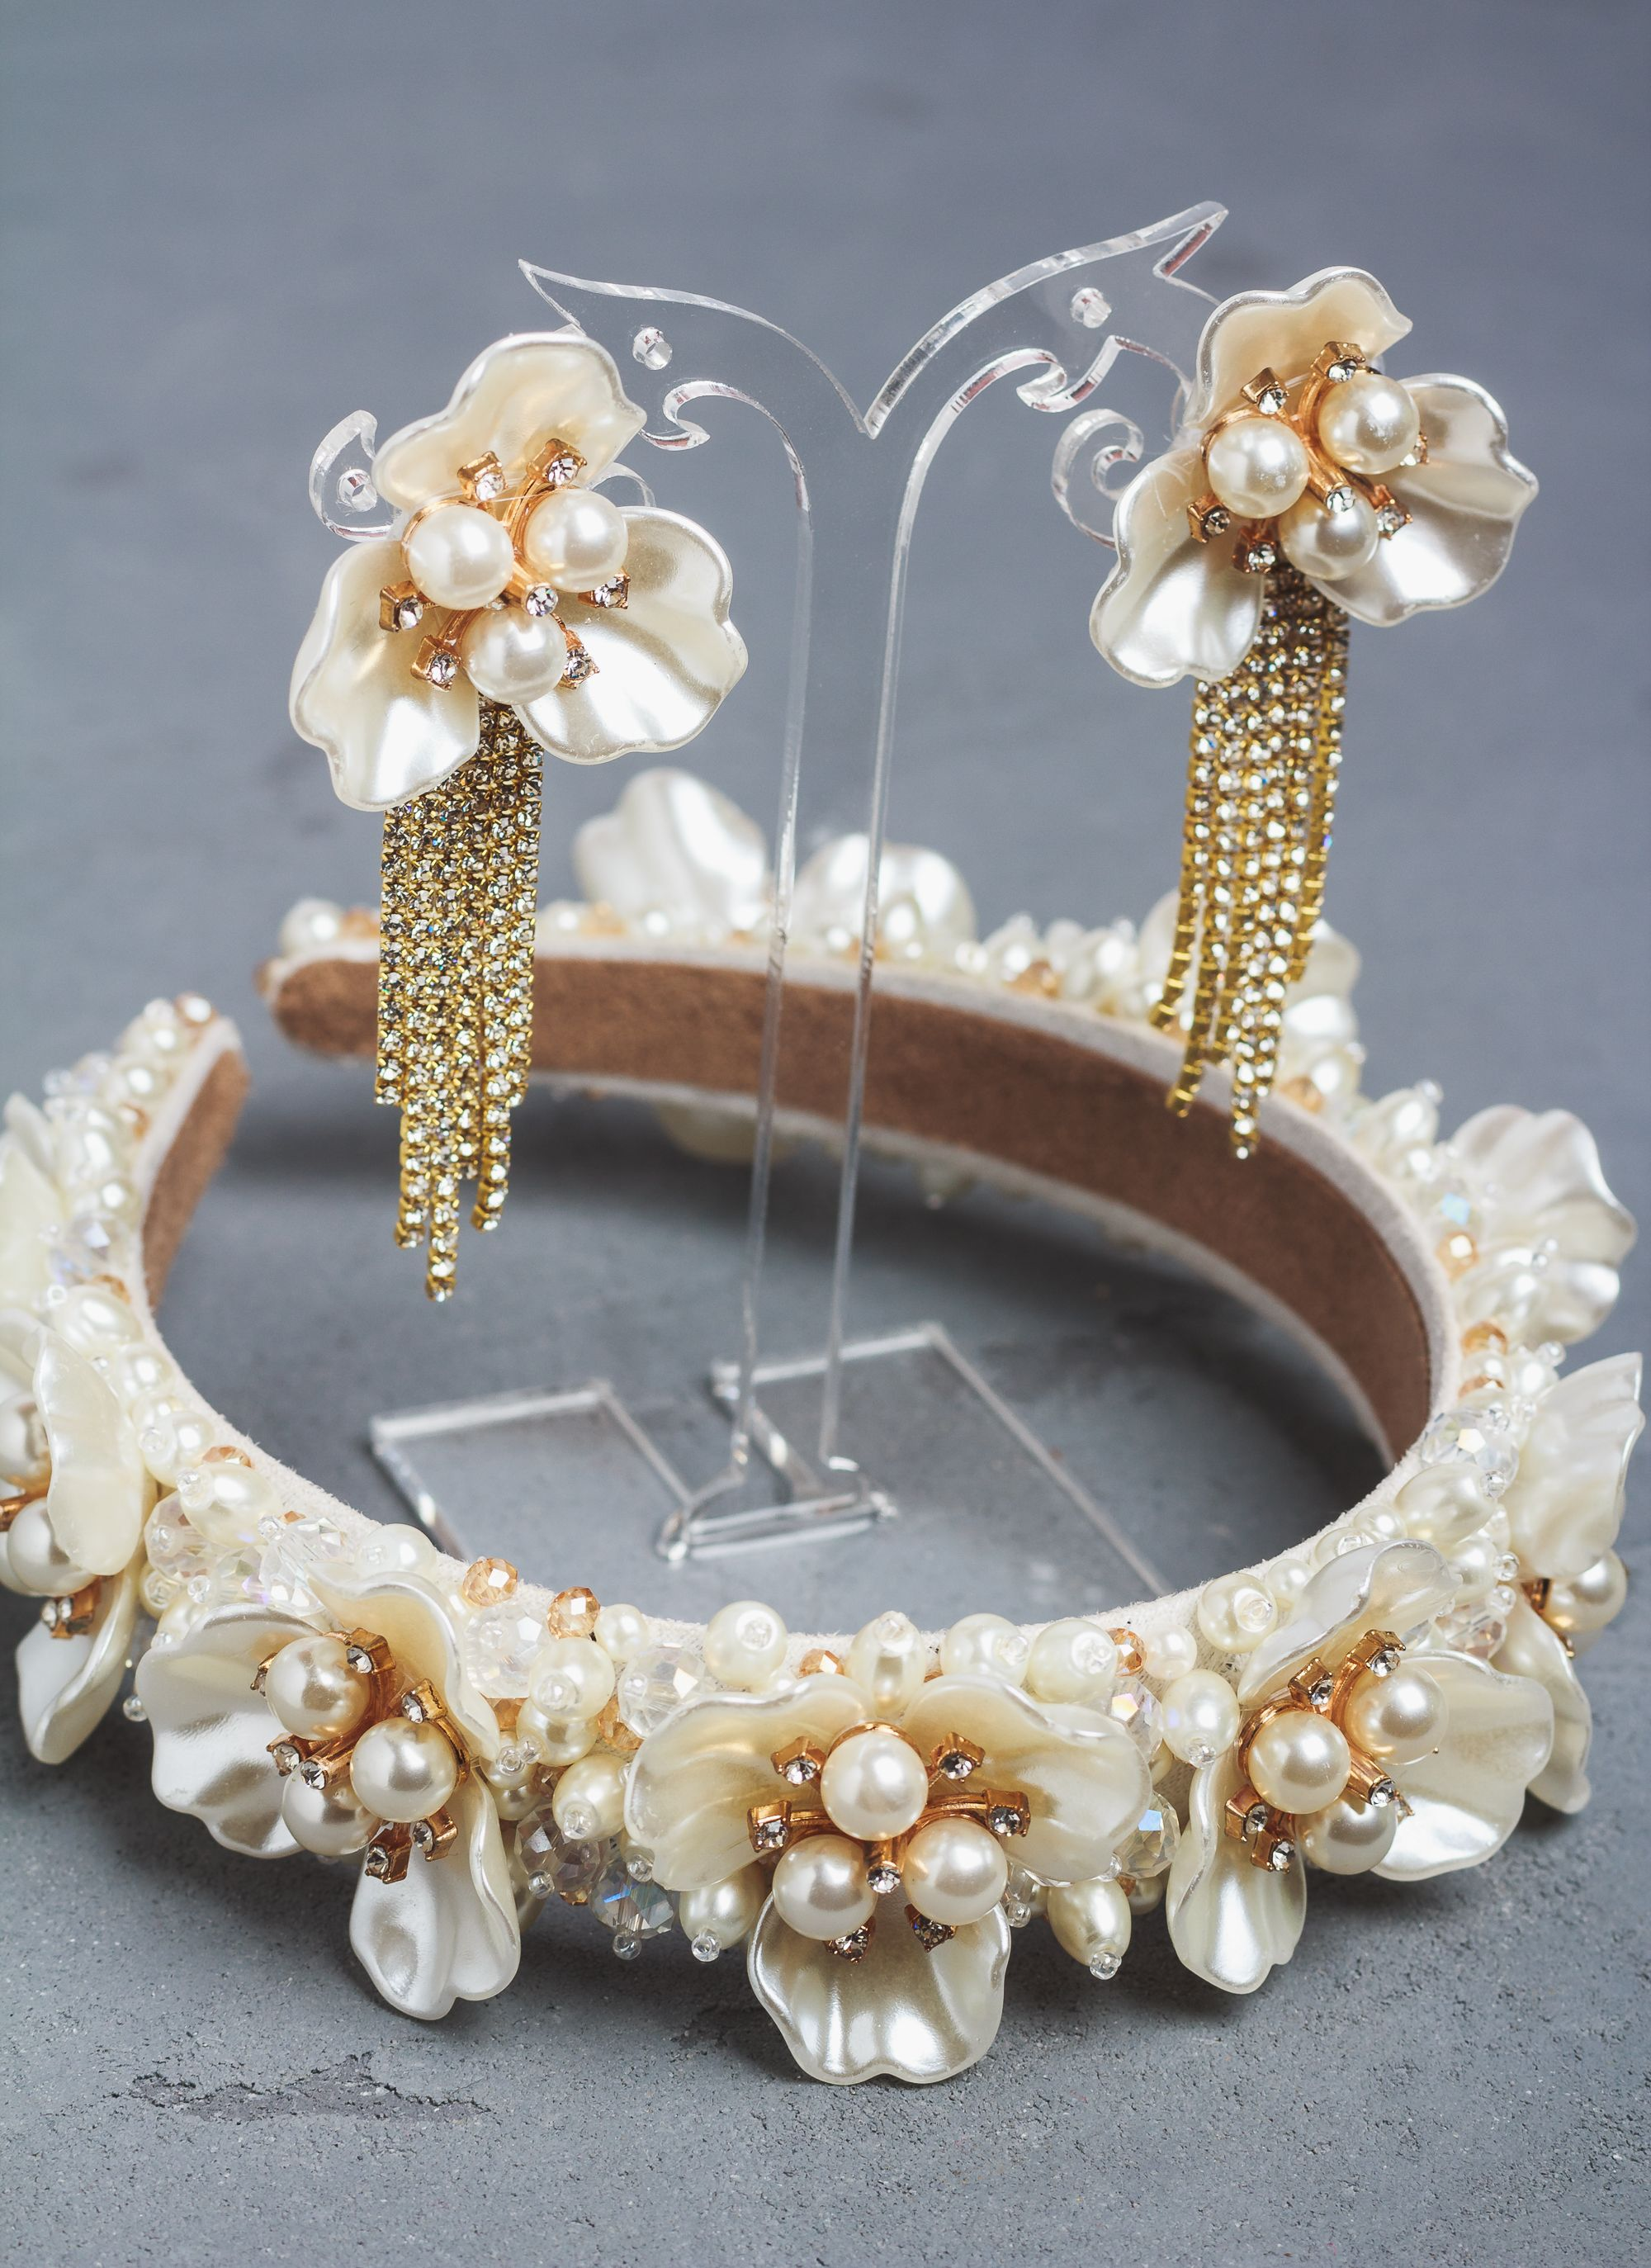 Baroque Women/'s Embellished Headband Hairband Crown Crystal Flower Pearl Wedding